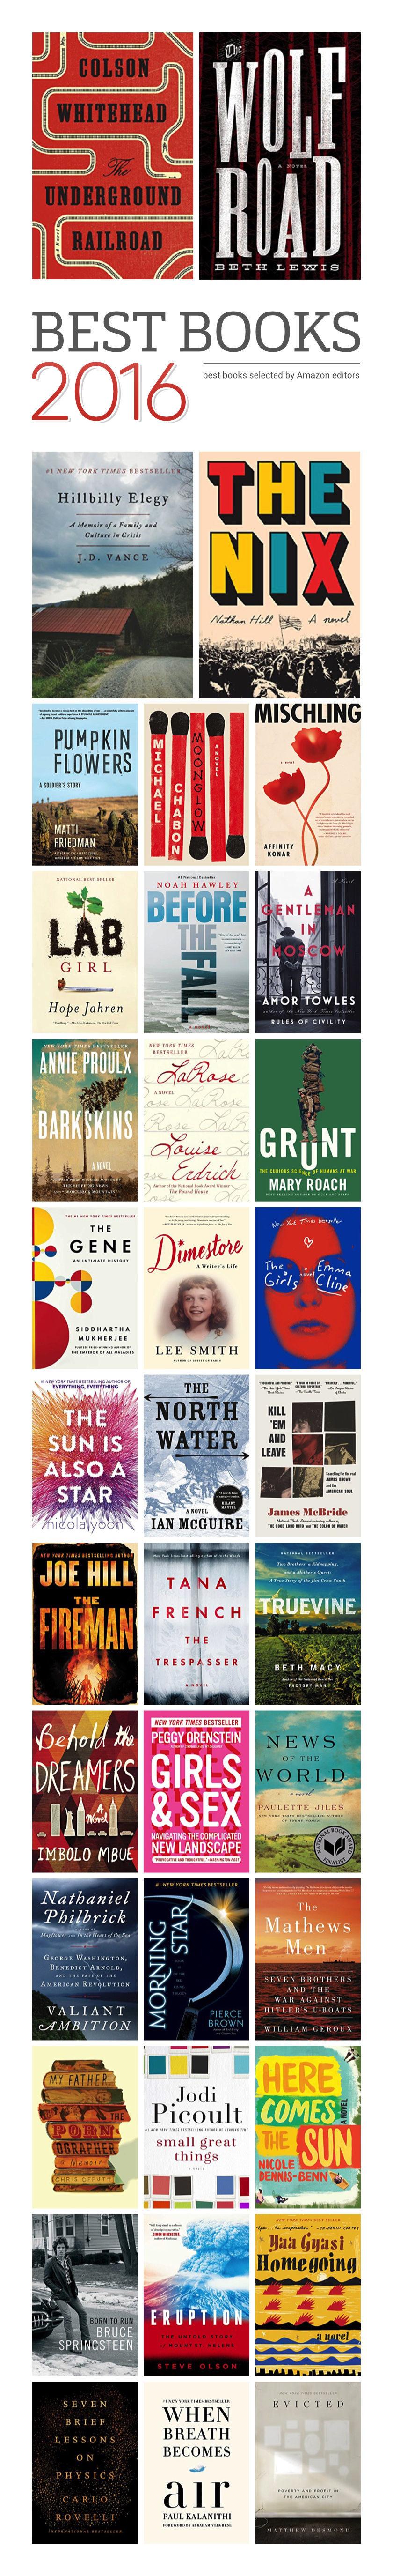 Amazon's 100 best books of 2016 #infographic